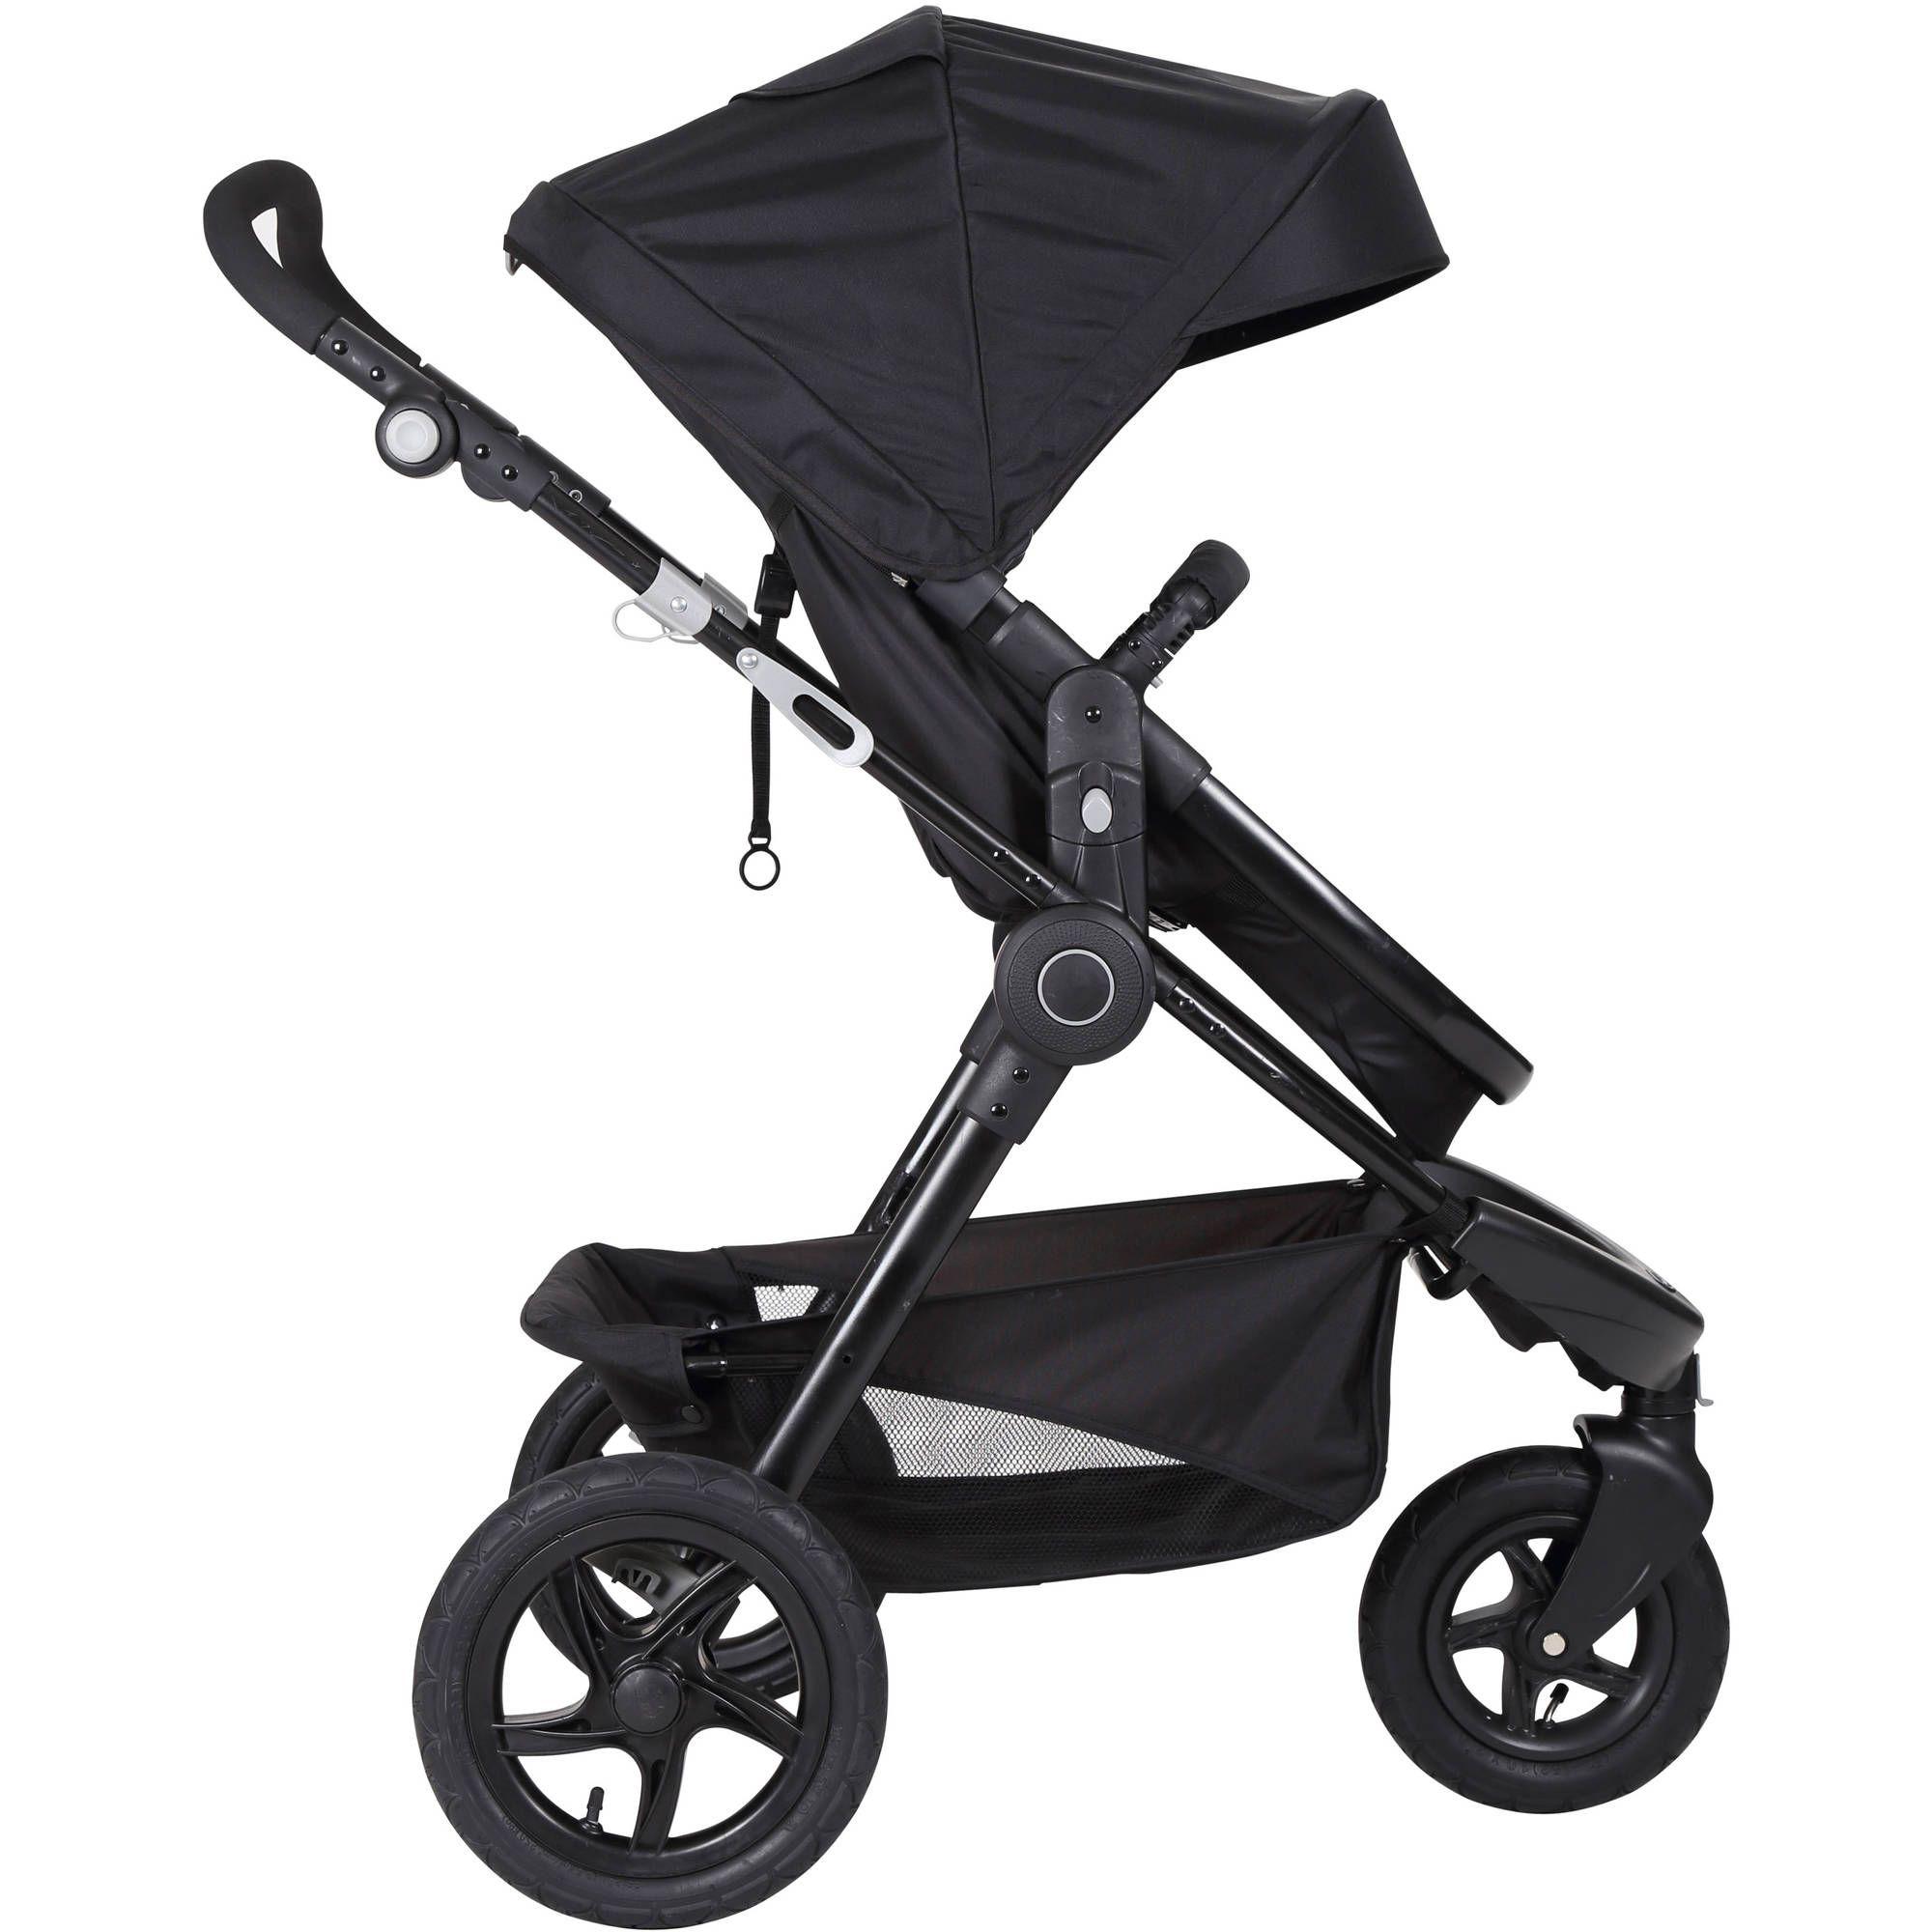 Baby Trend Stroller Debut 3Wheel Toddler Cascade eBay